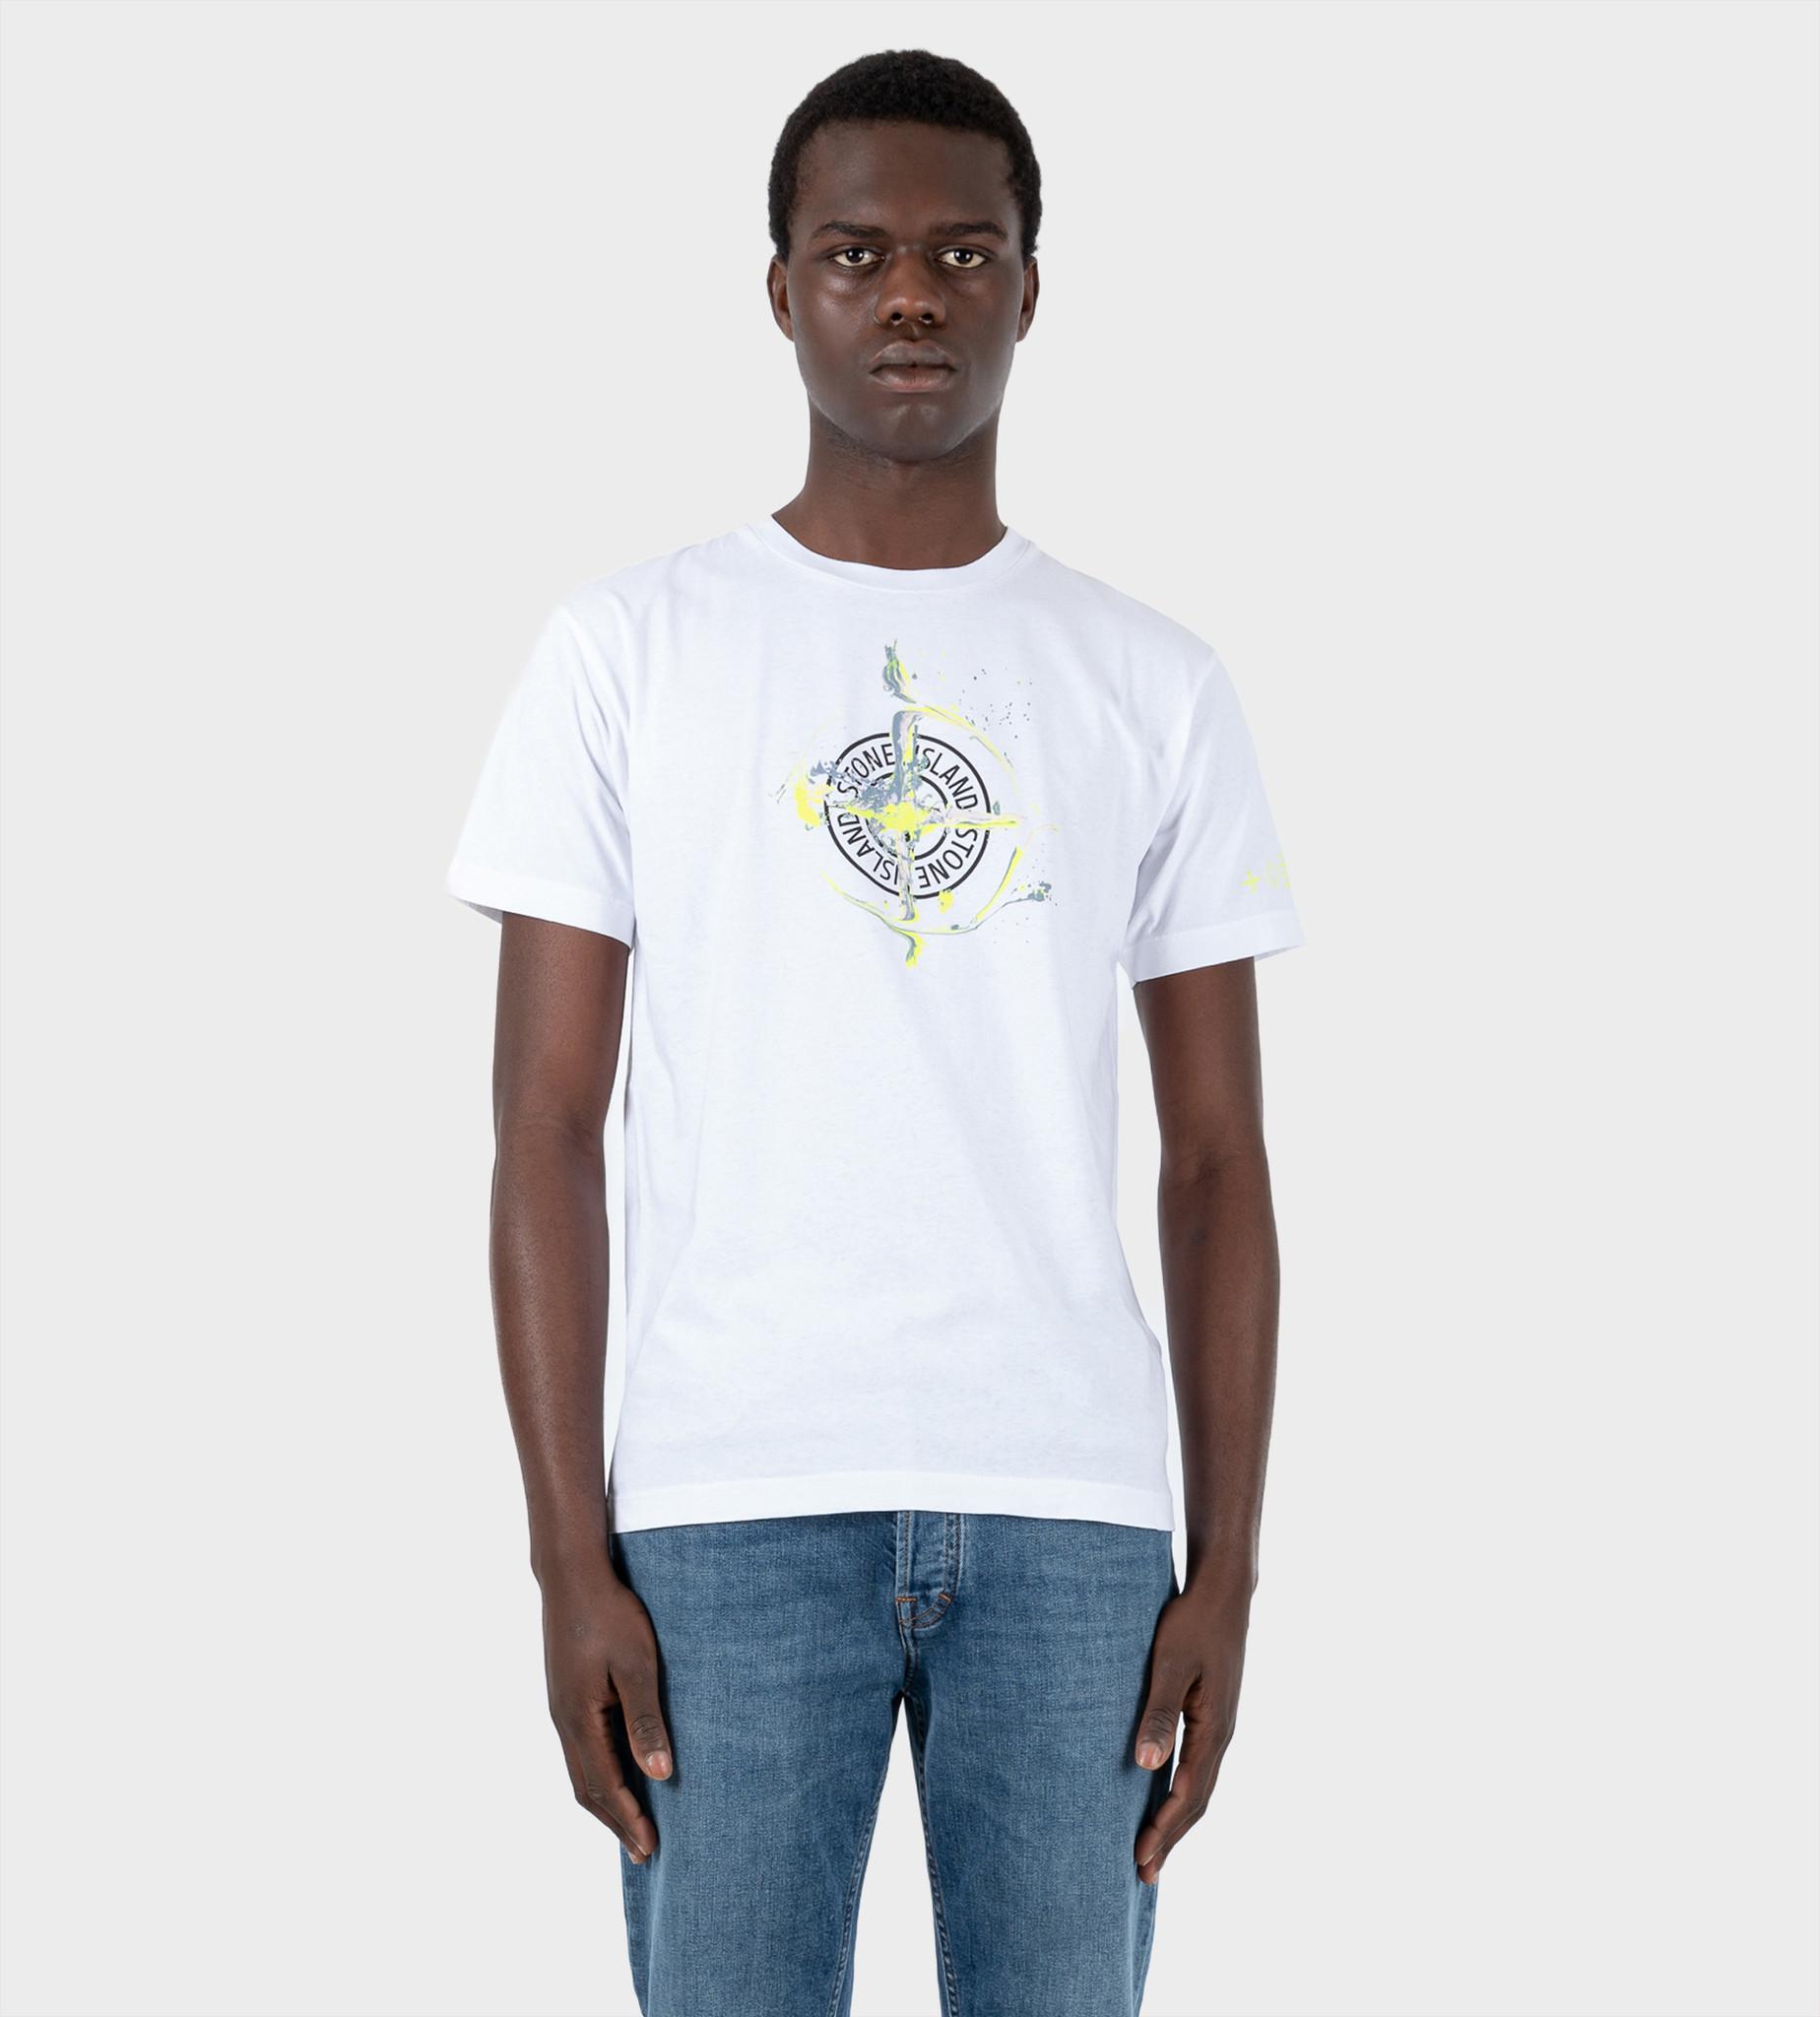 STONE ISLAND 2NS83 Paint T-shirt White